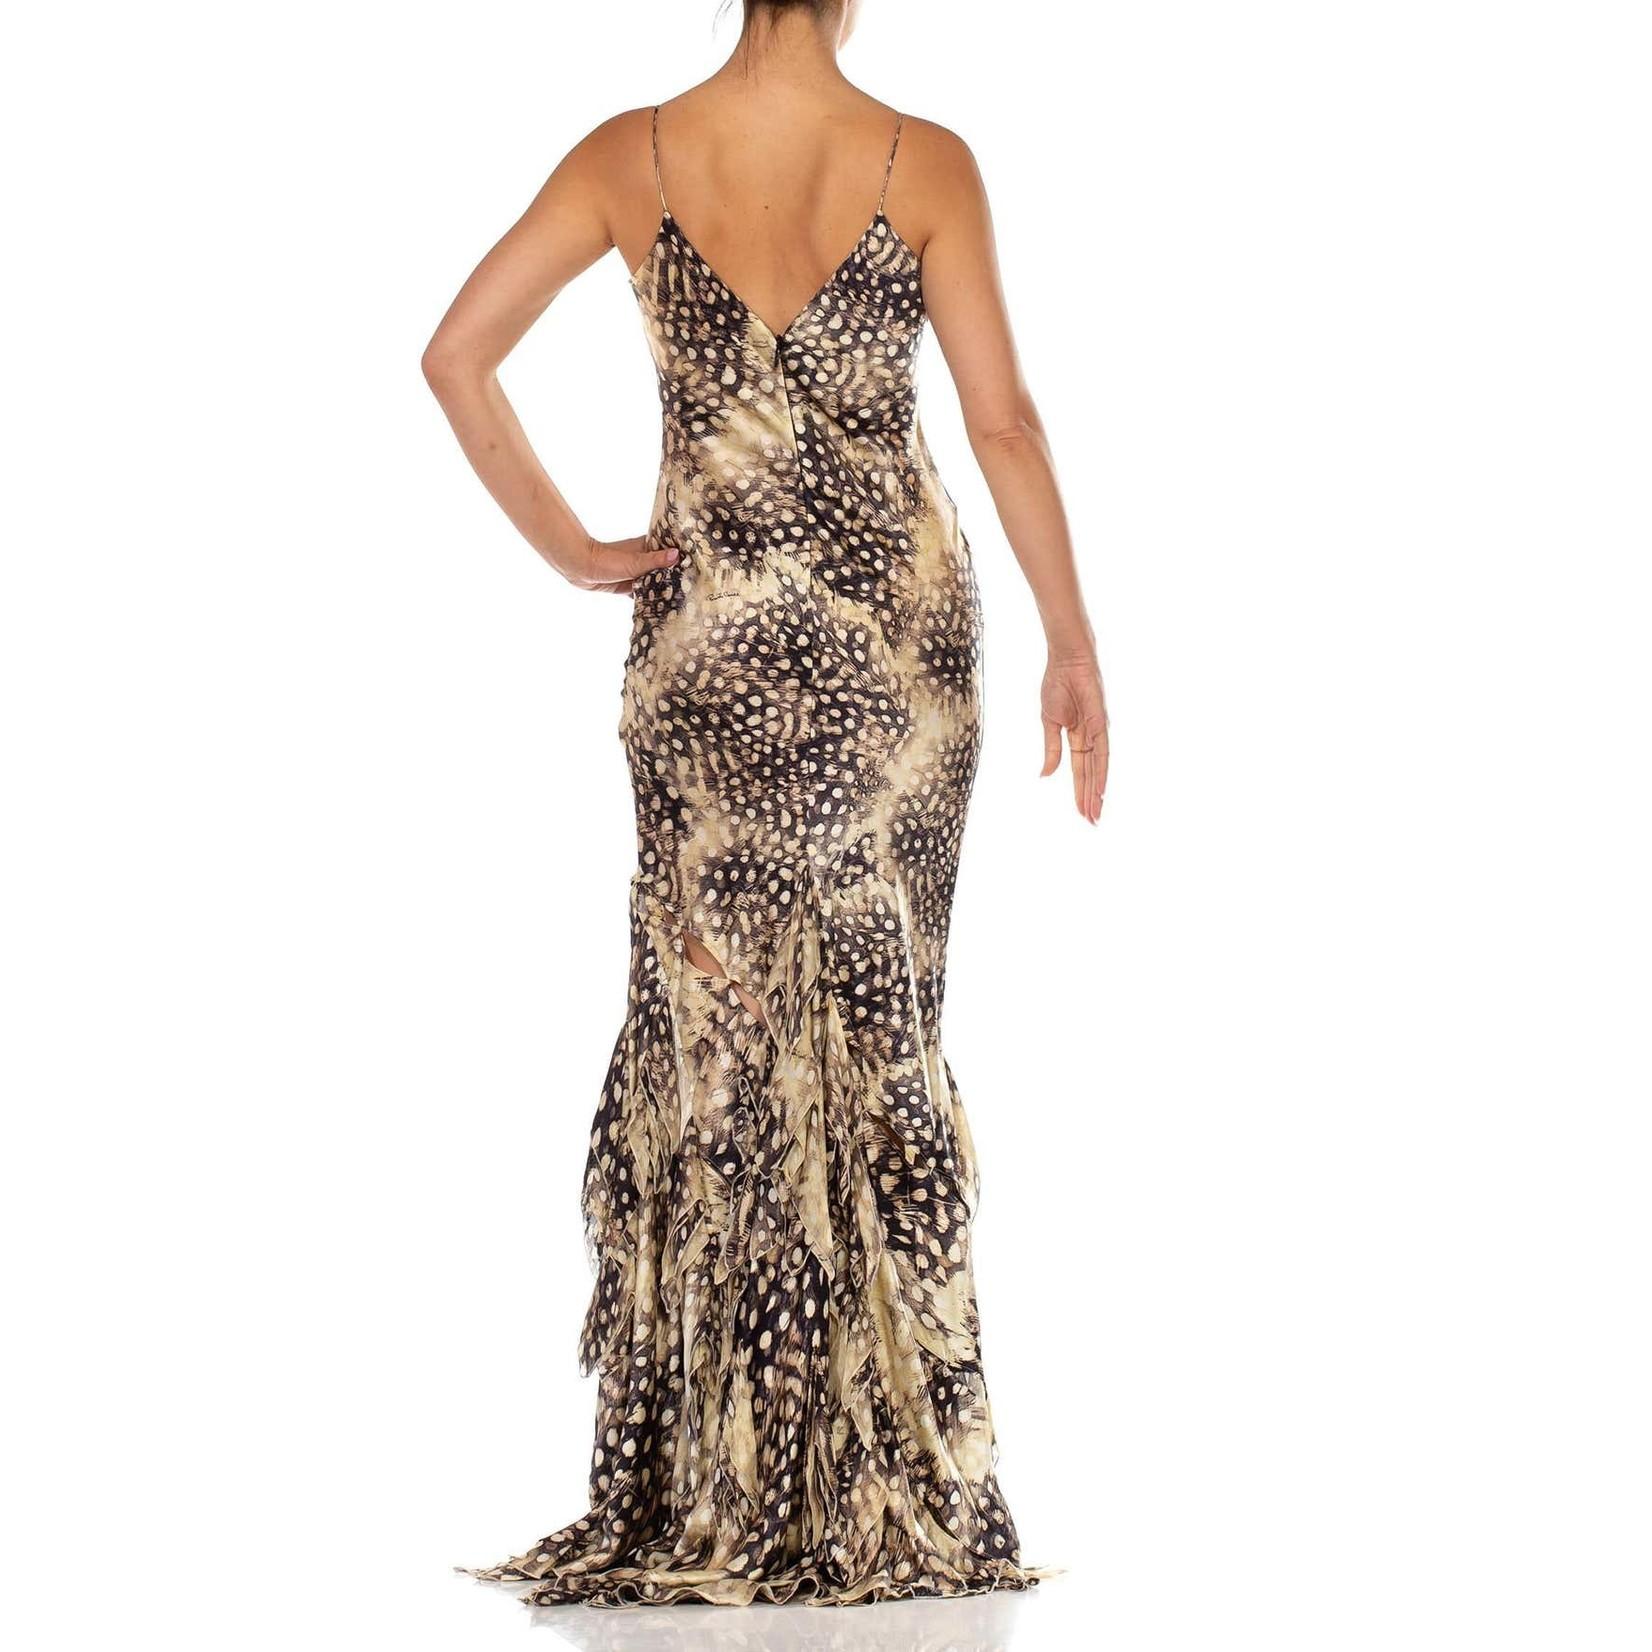 Morphew 2000s Roberto Cavalli Bias Cut Silk Charmeuse Feather Print Gown with Slashed Skirt & Chiffon Petals